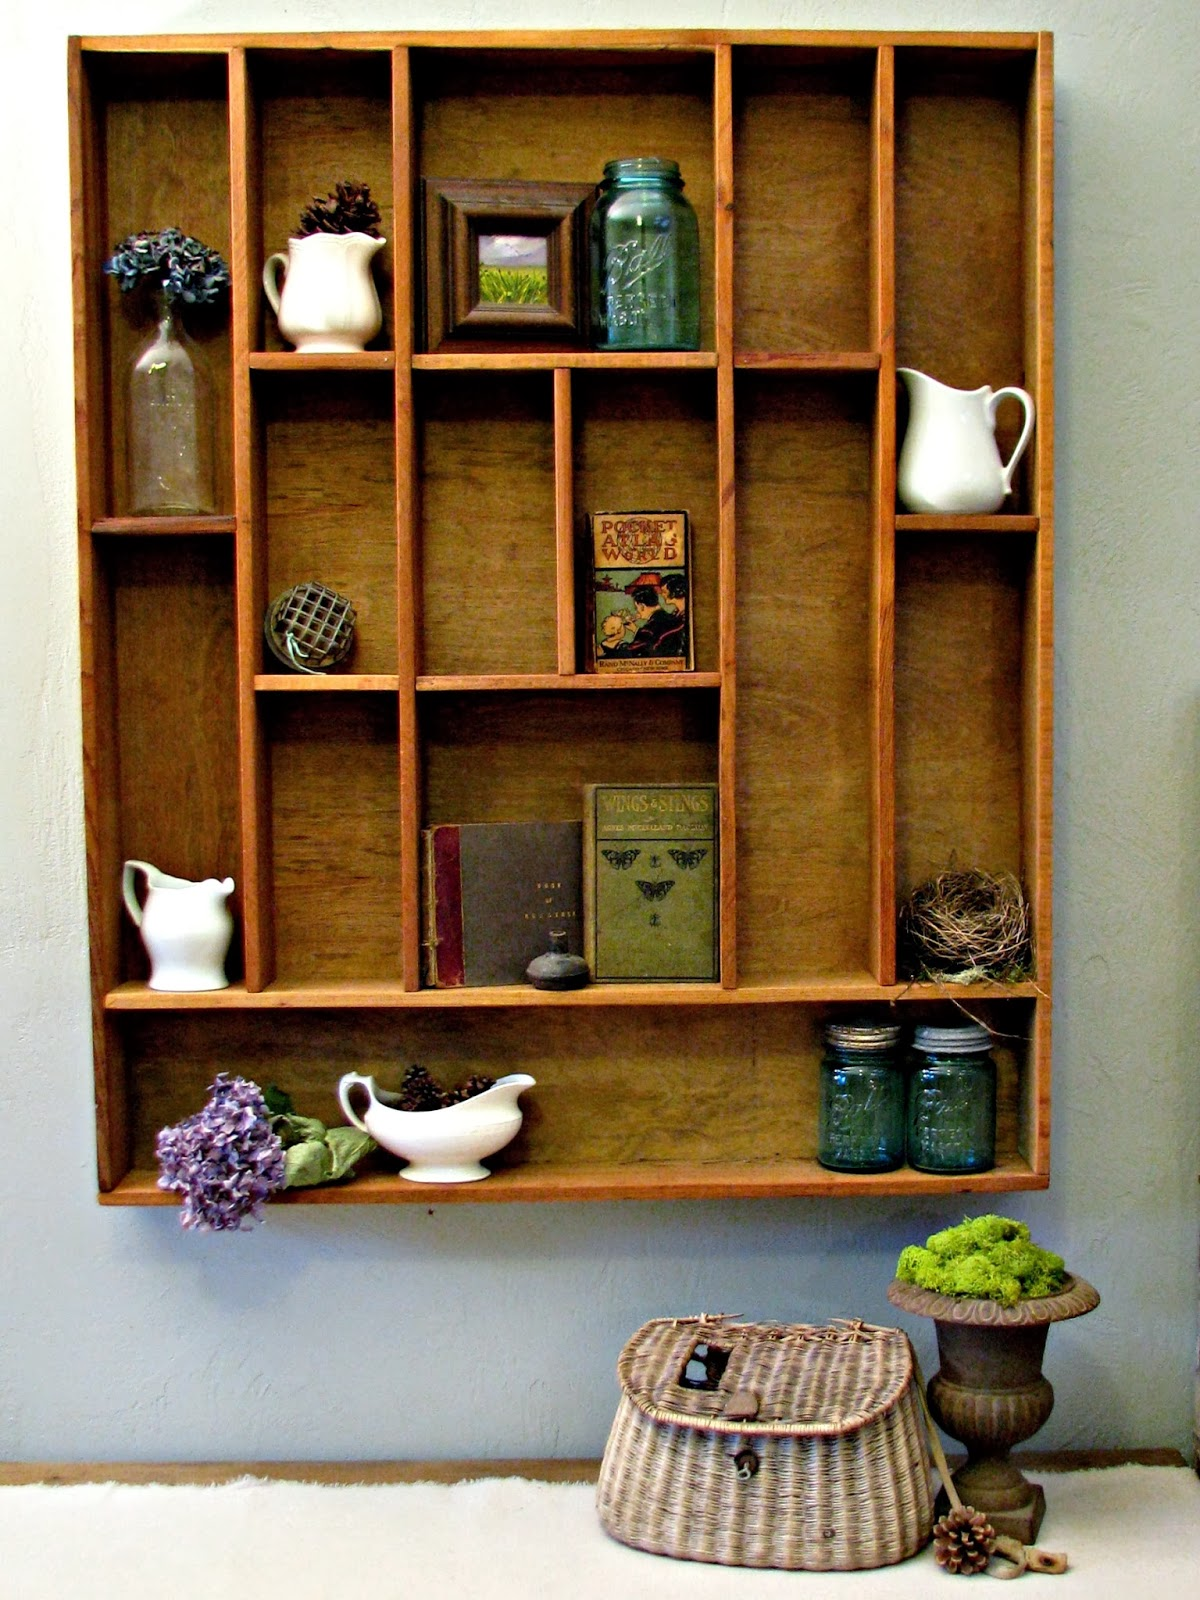 blue roof cabin: DIY Letterpress Tray, Display Shelf Tutorial